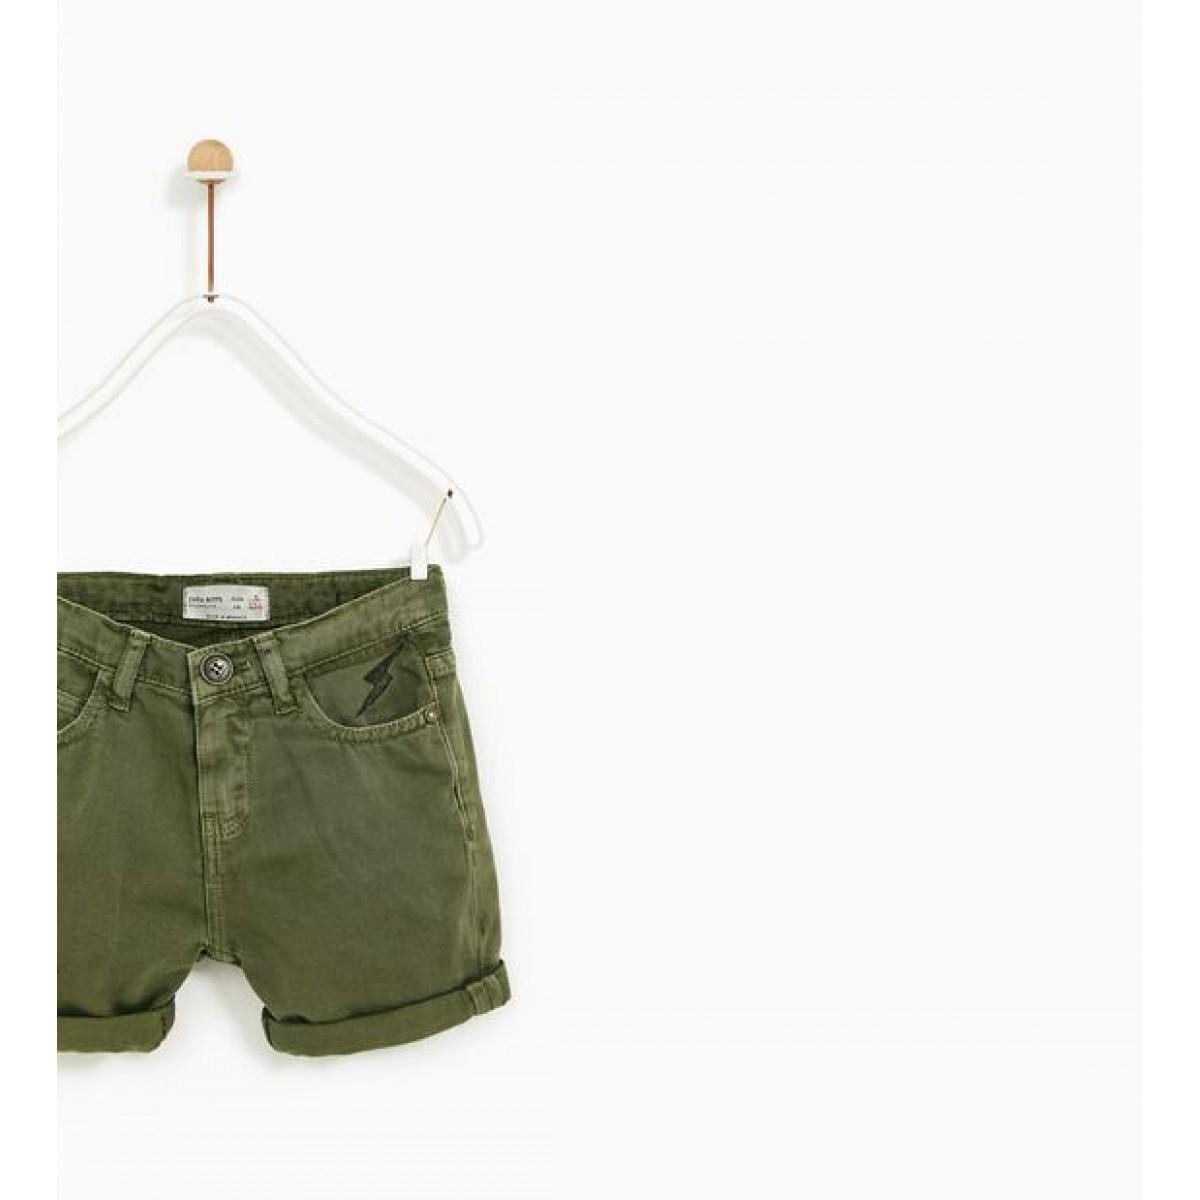 Zara 'Rock' Prints Bermuda Shorts